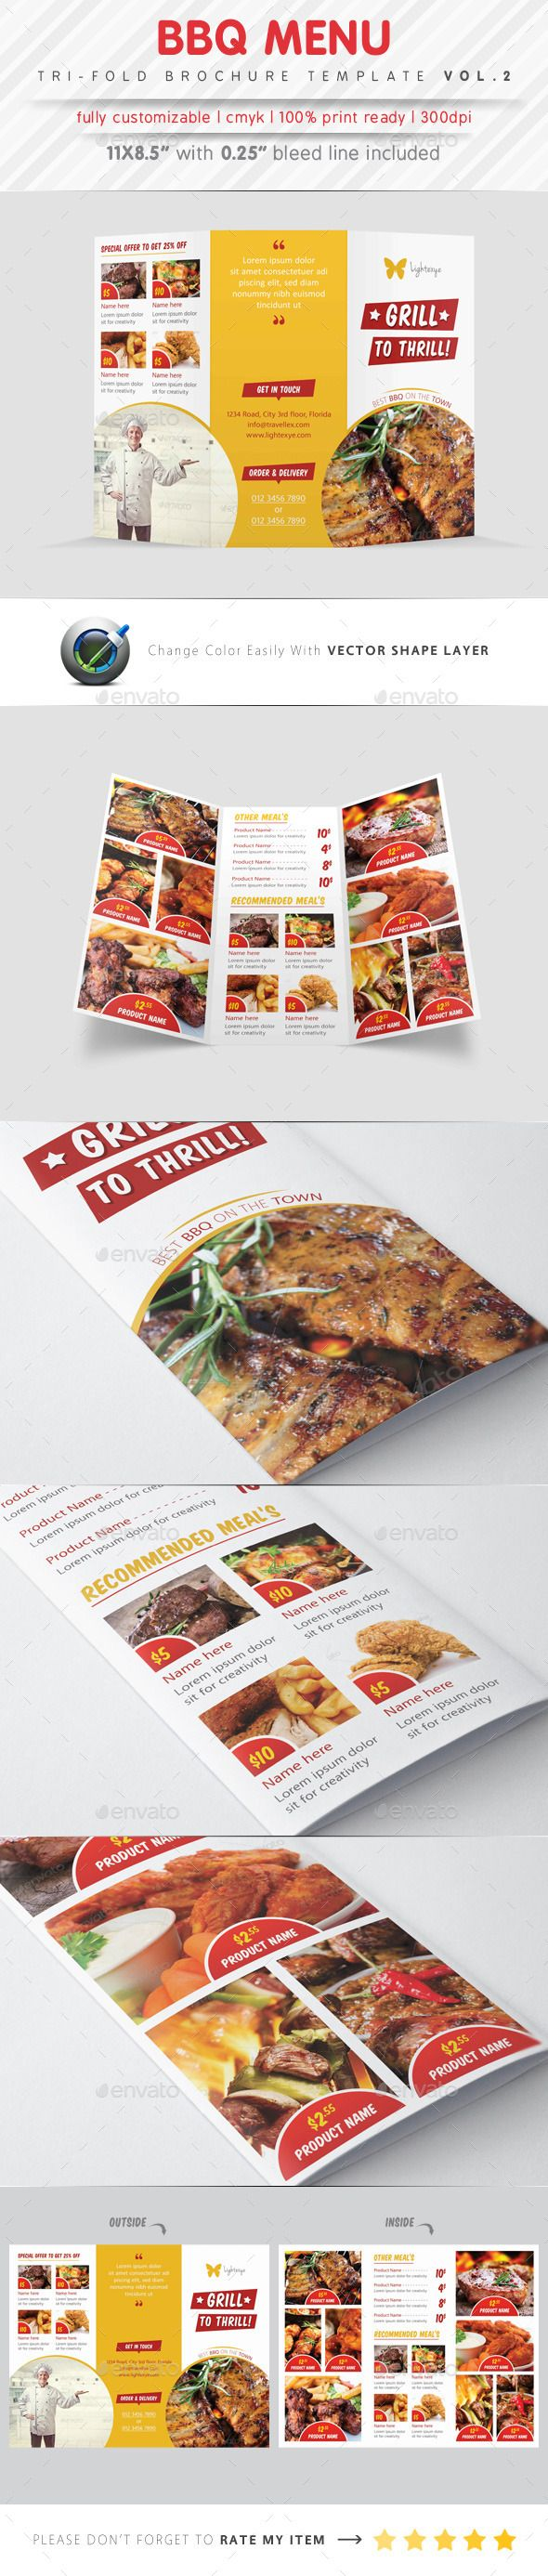 21 best Menu Designs images on Pinterest | Restaurant menu design ...